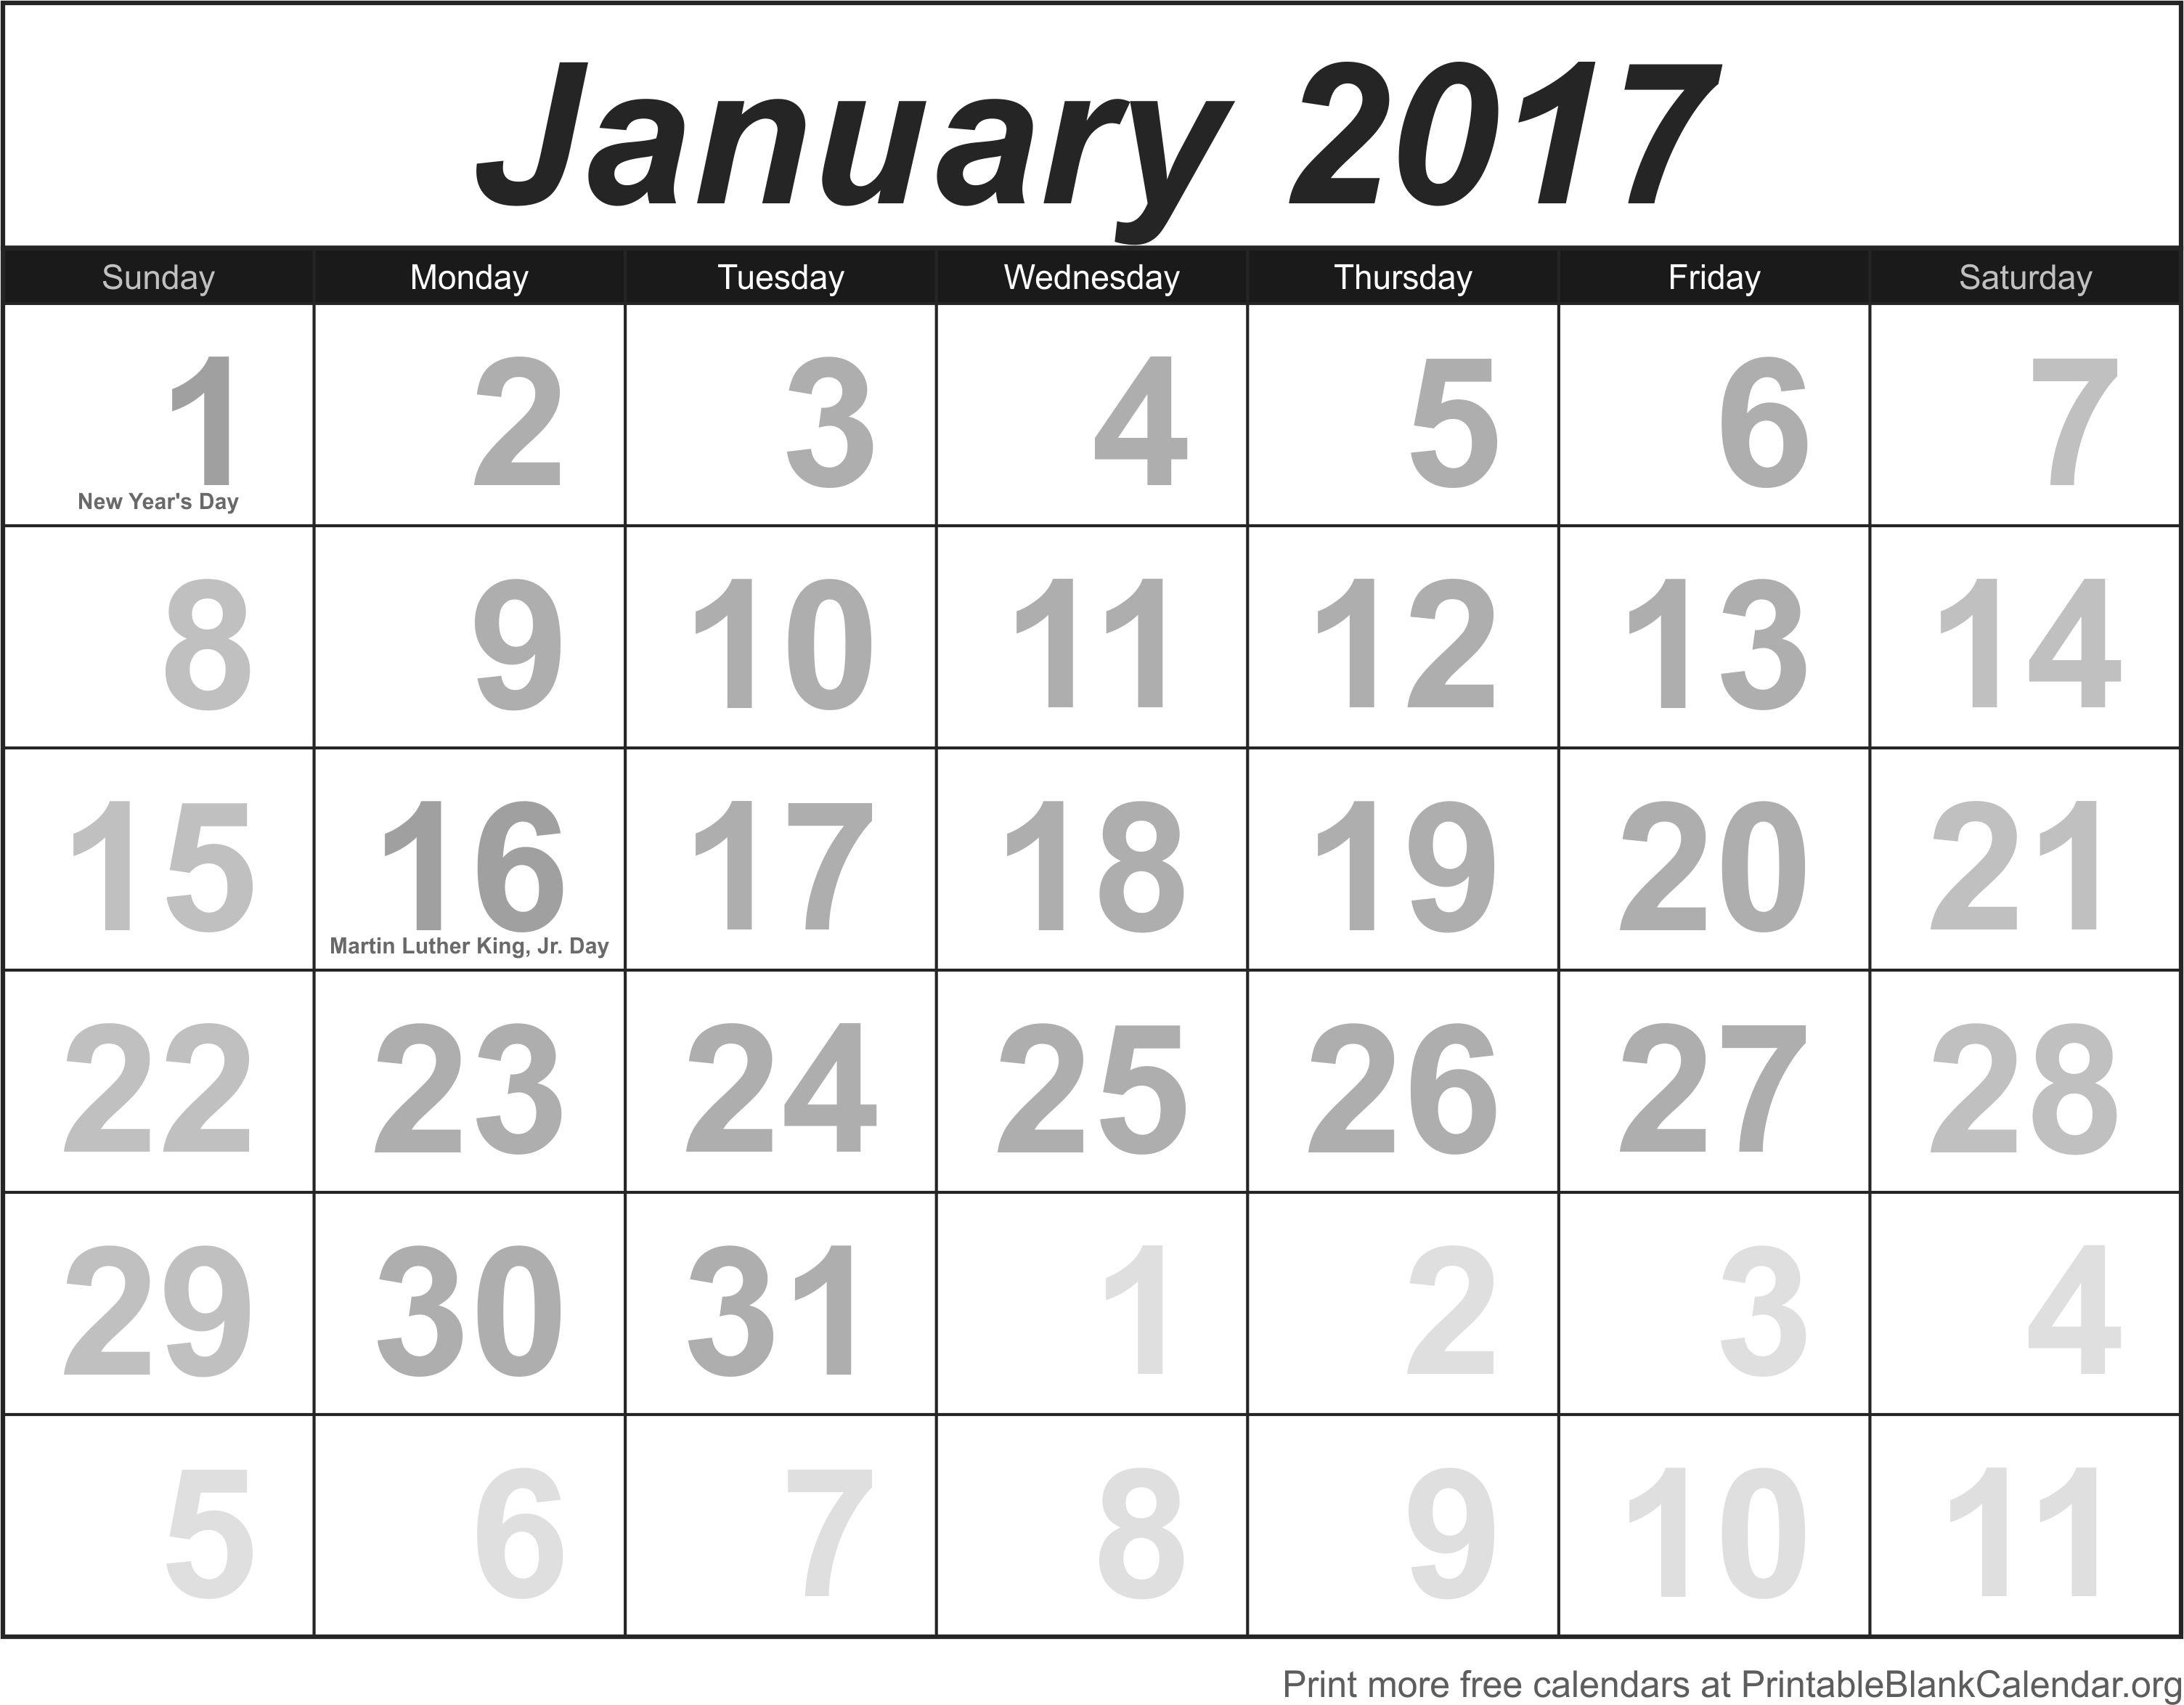 January 2017 Printable Calendar